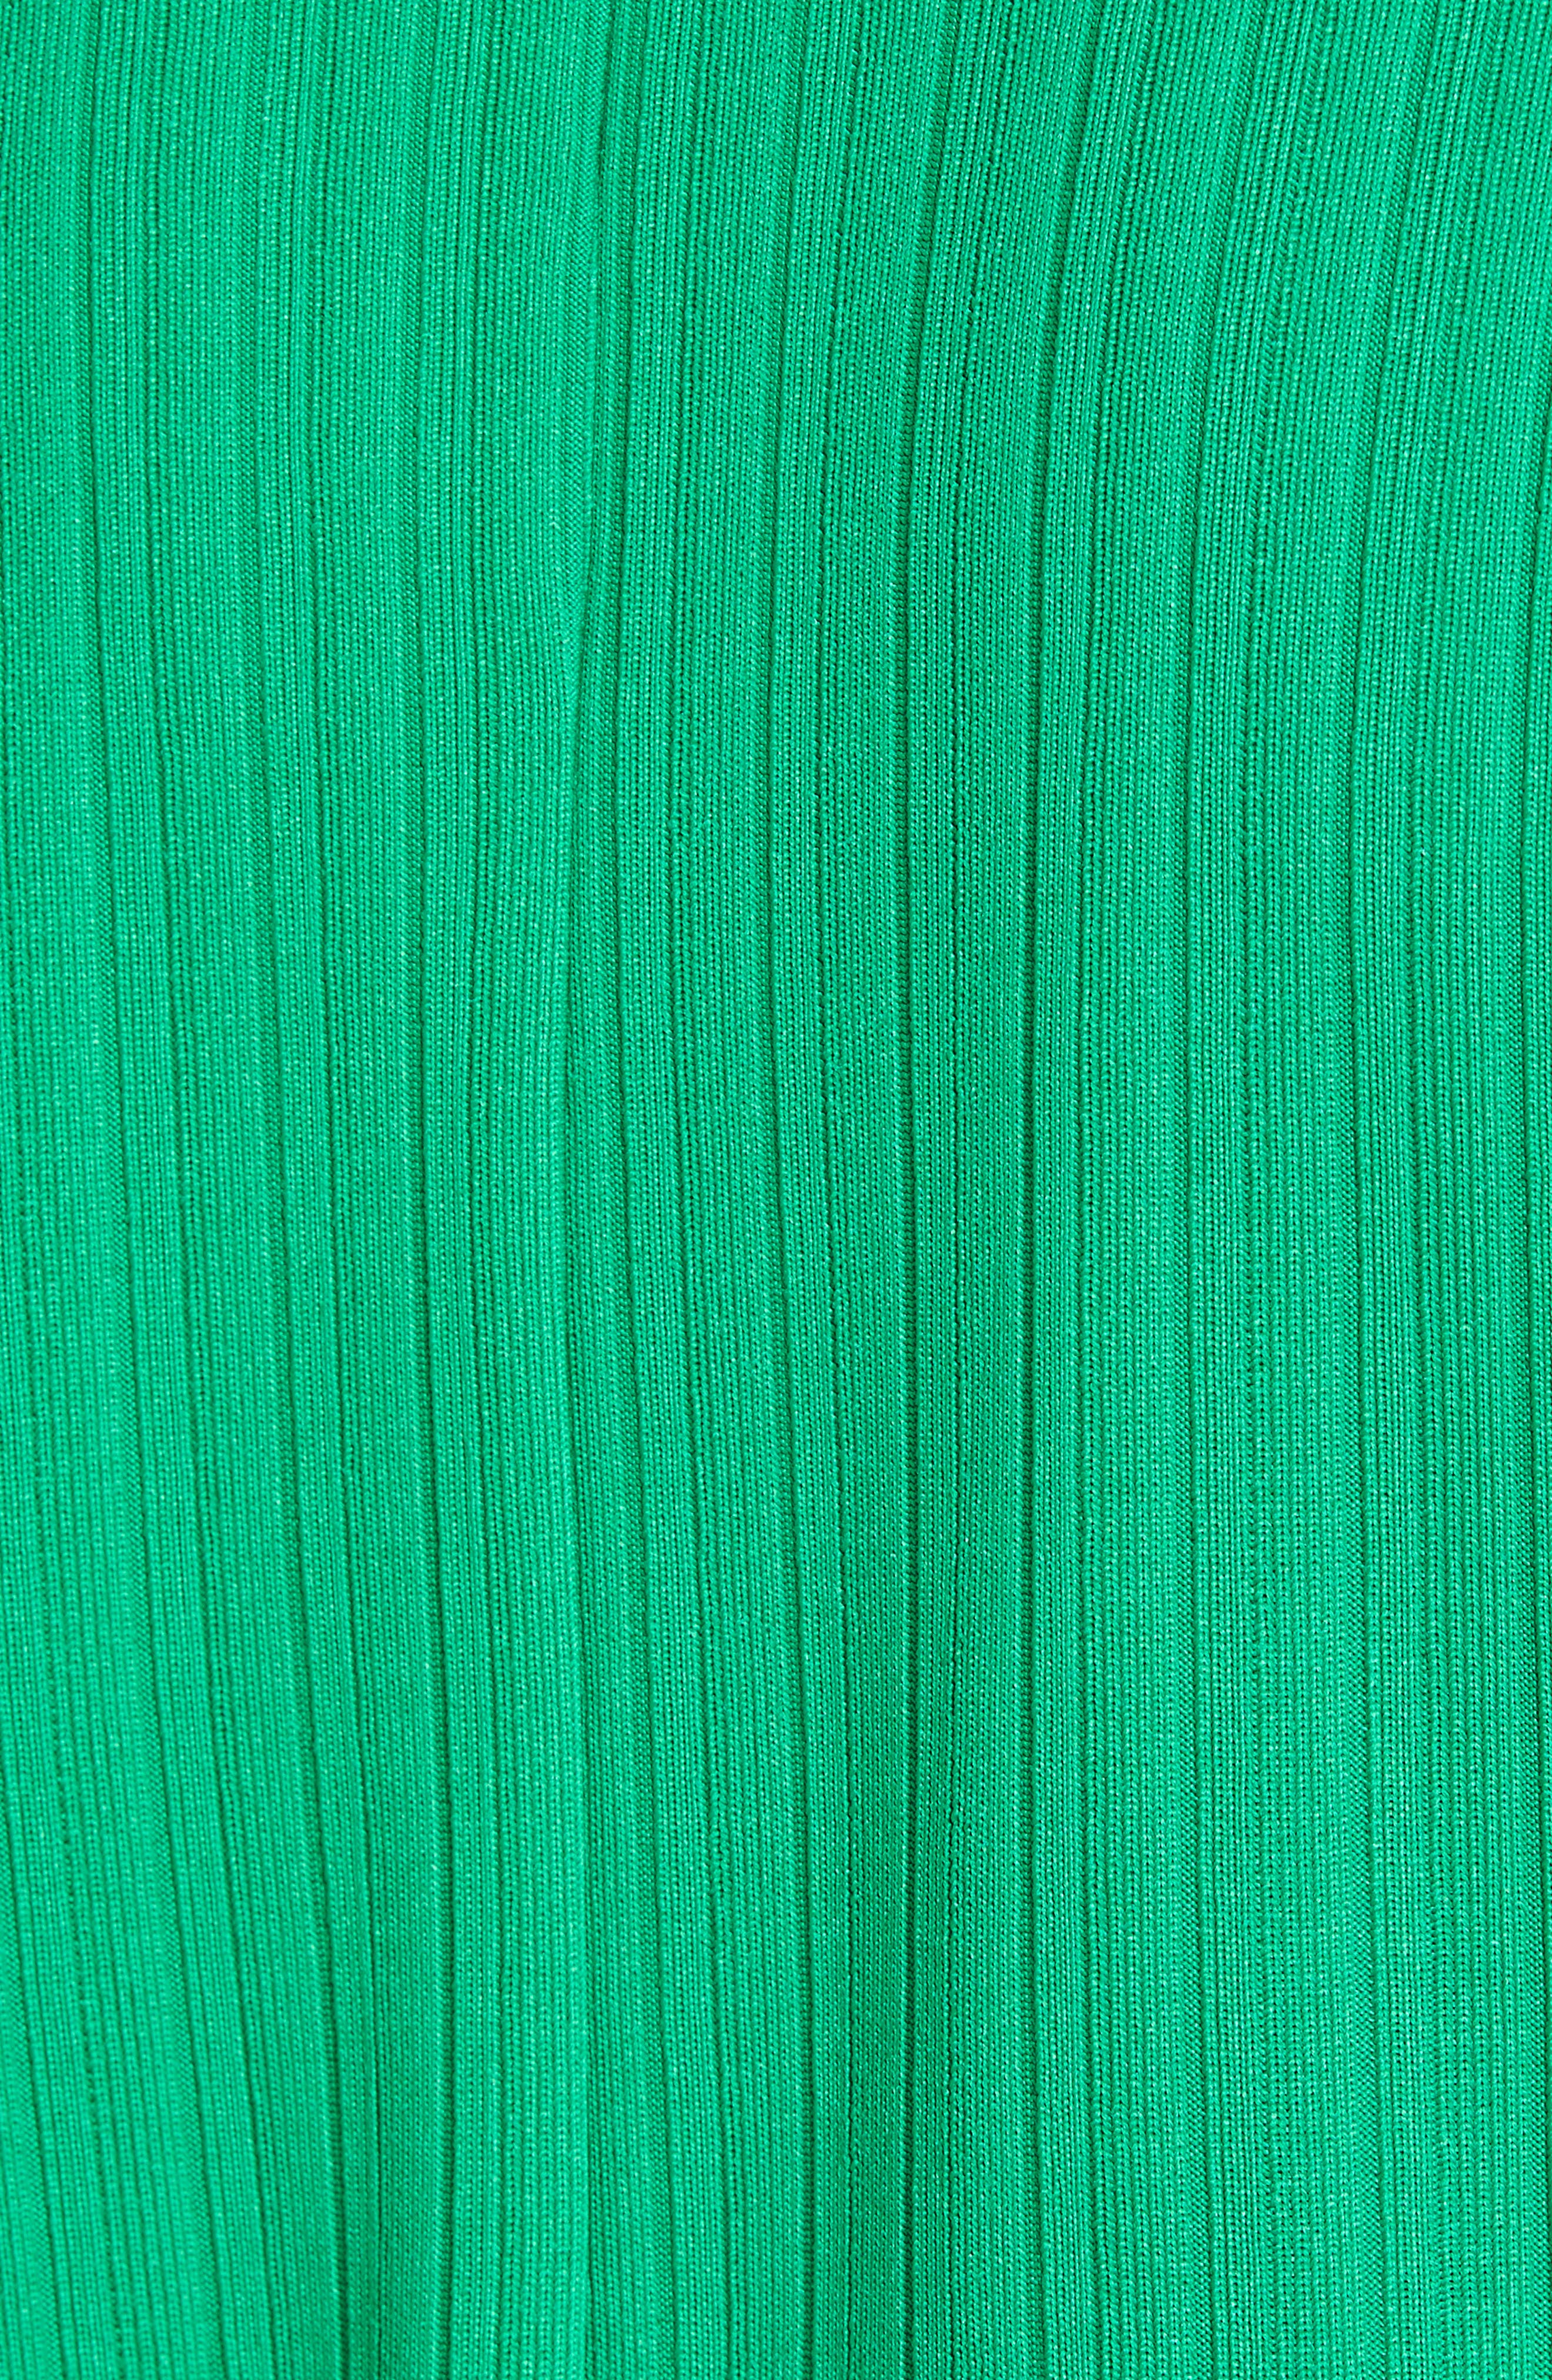 Ribbed Knit Cold Shoulder Top,                             Alternate thumbnail 5, color,                             347